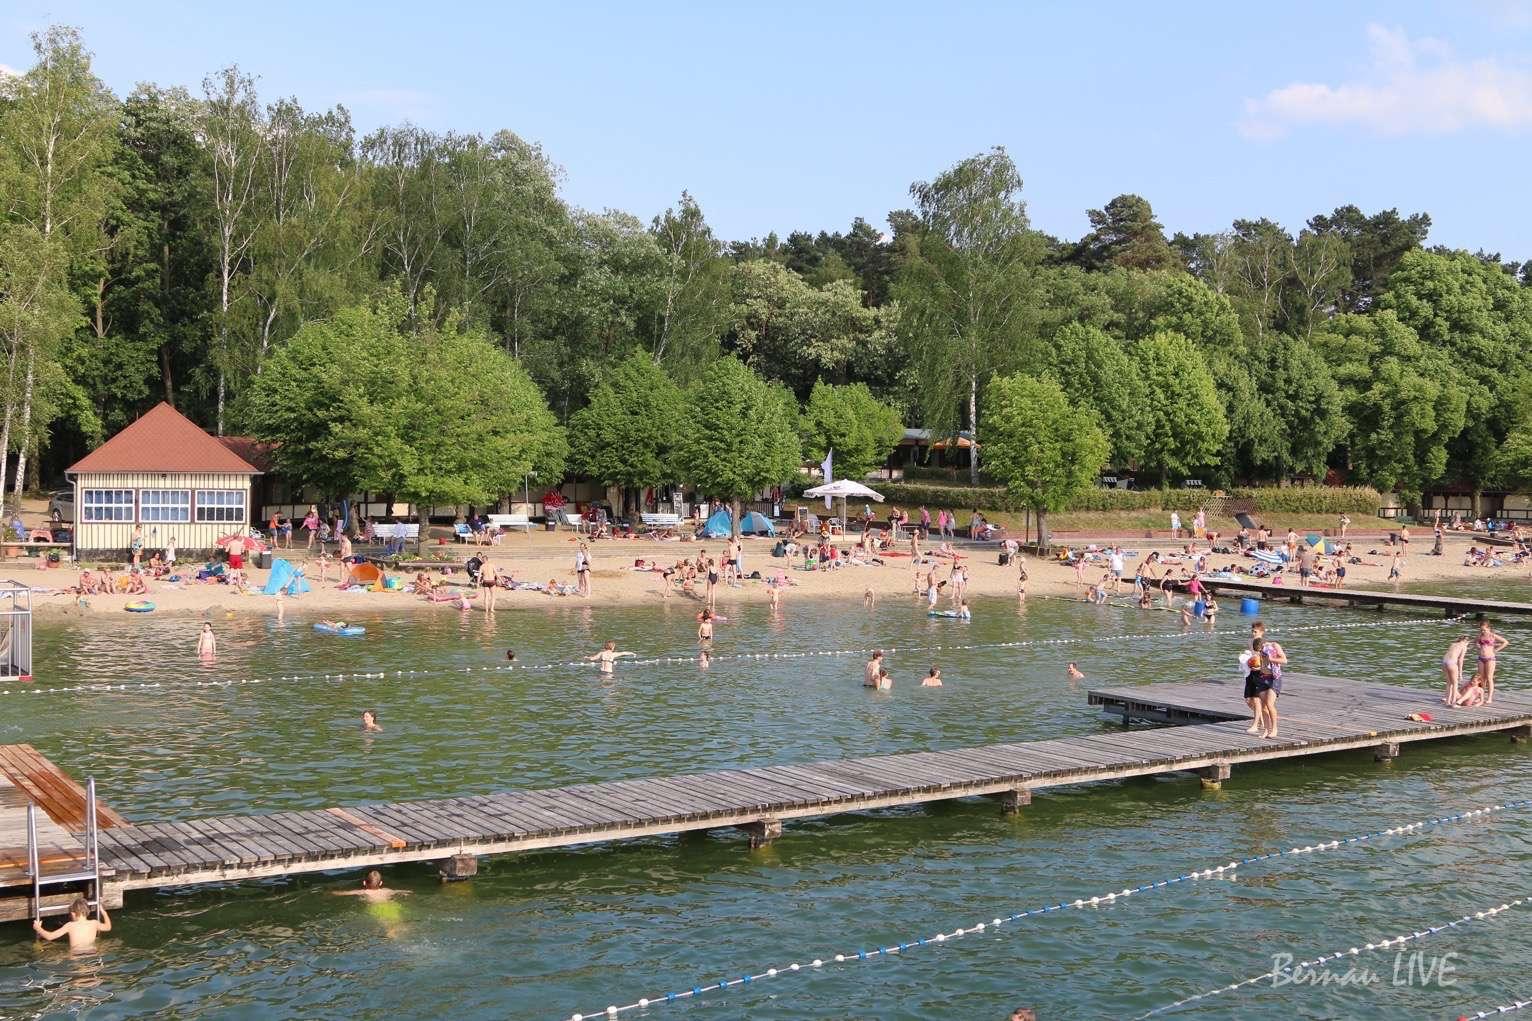 Wukensee, Biesenthal, Strandbad Wukensee, Sommer, Bernau LIVE